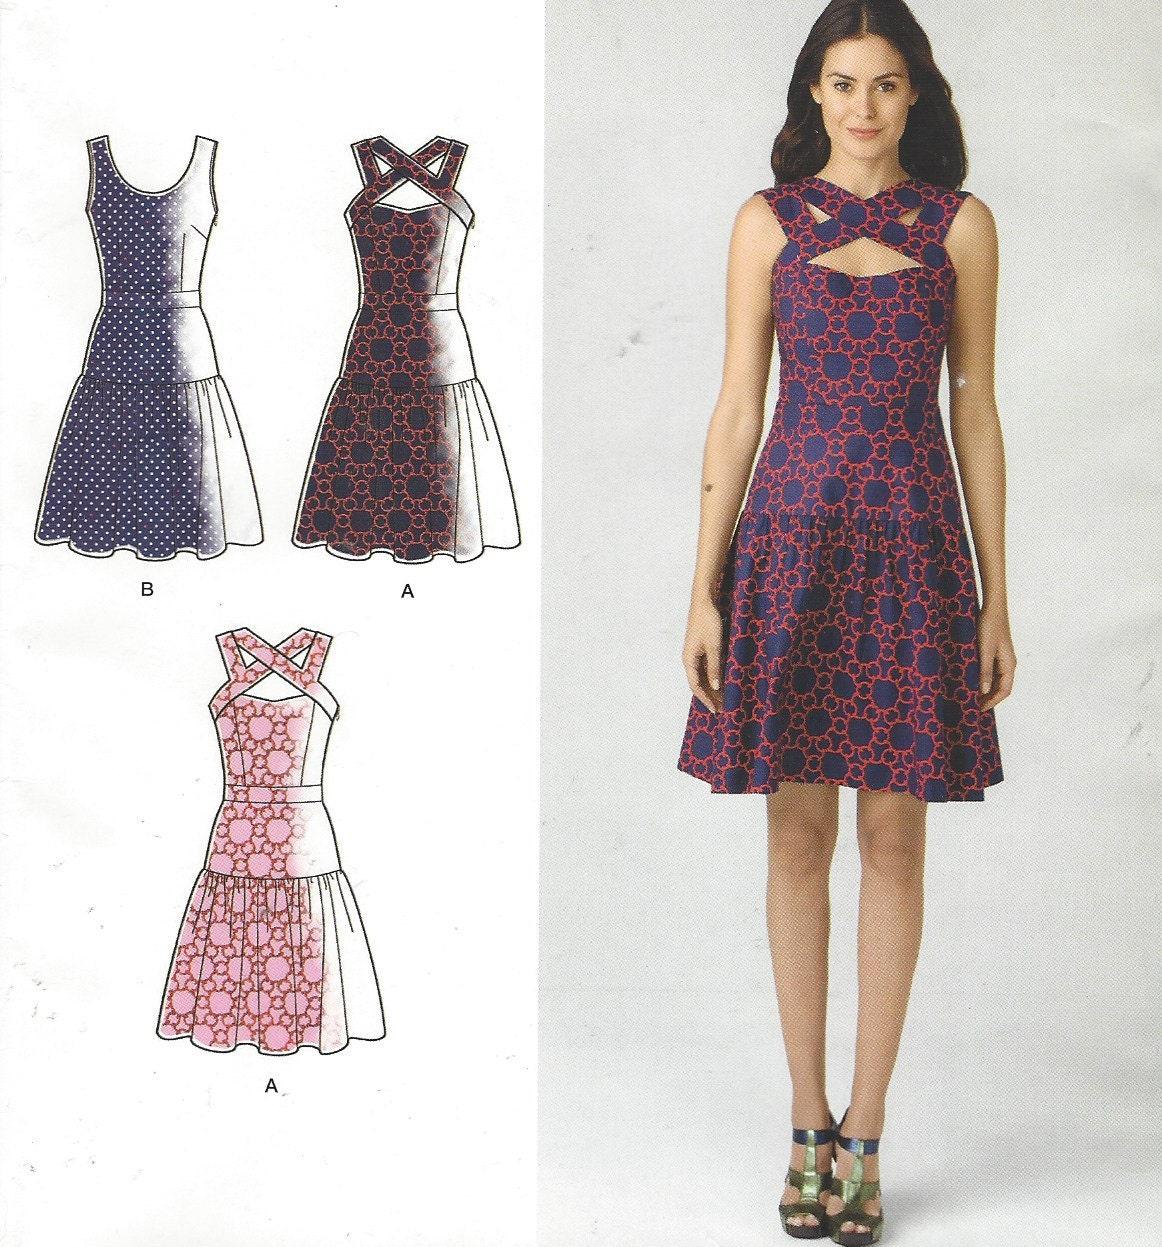 Cynthia Rowley Sewing Patterns: Cynthia Rowley Womens Dress With Bodice Variations